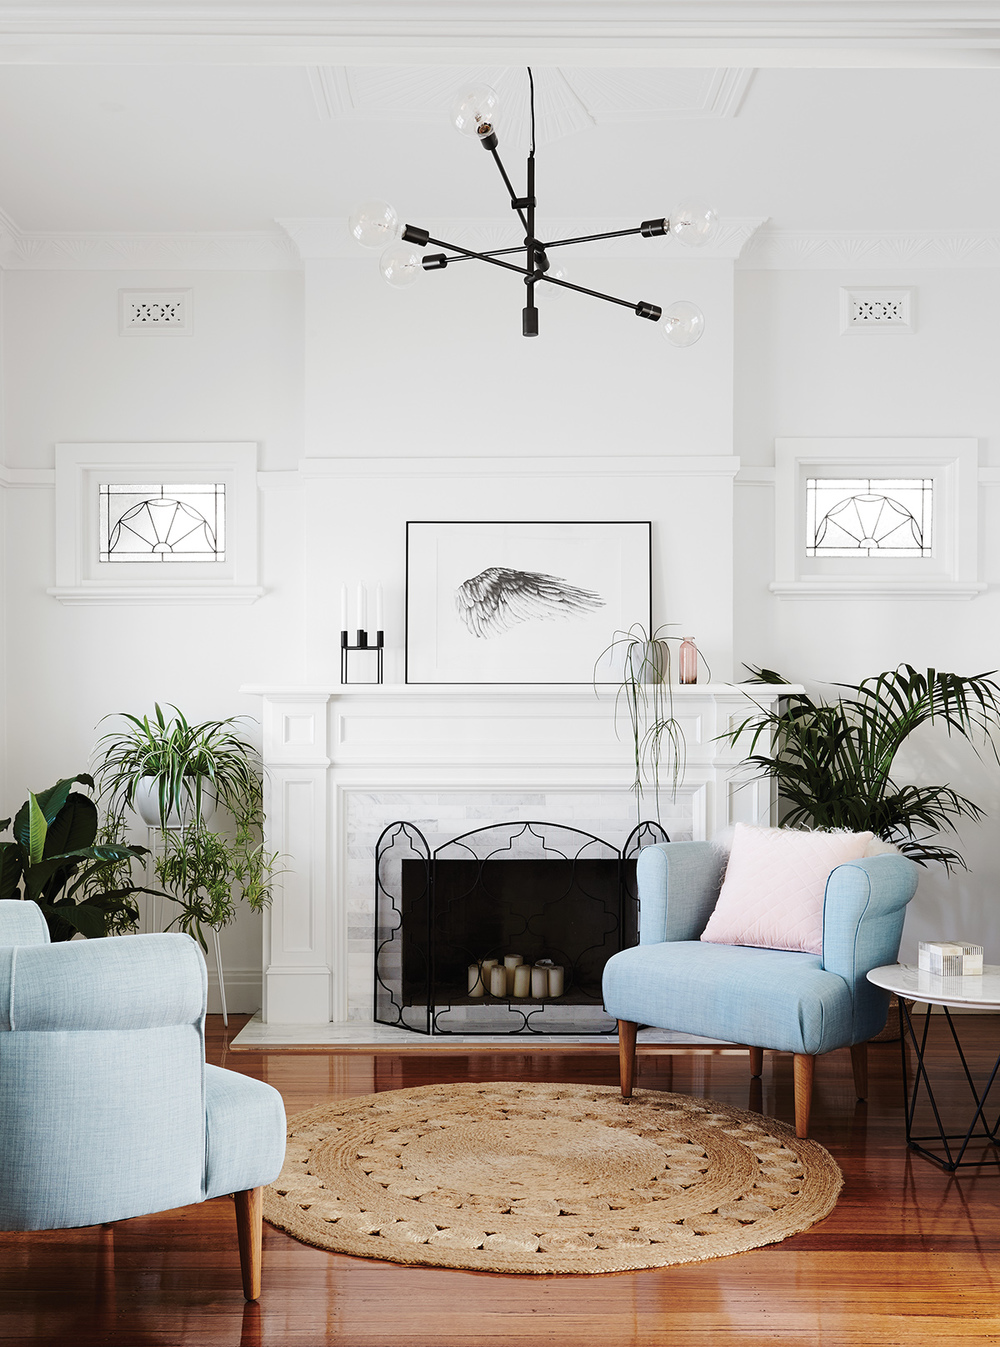 Photography: Annette O'Brien / Styling: Alana Langan / Interior design: Bask Interiors